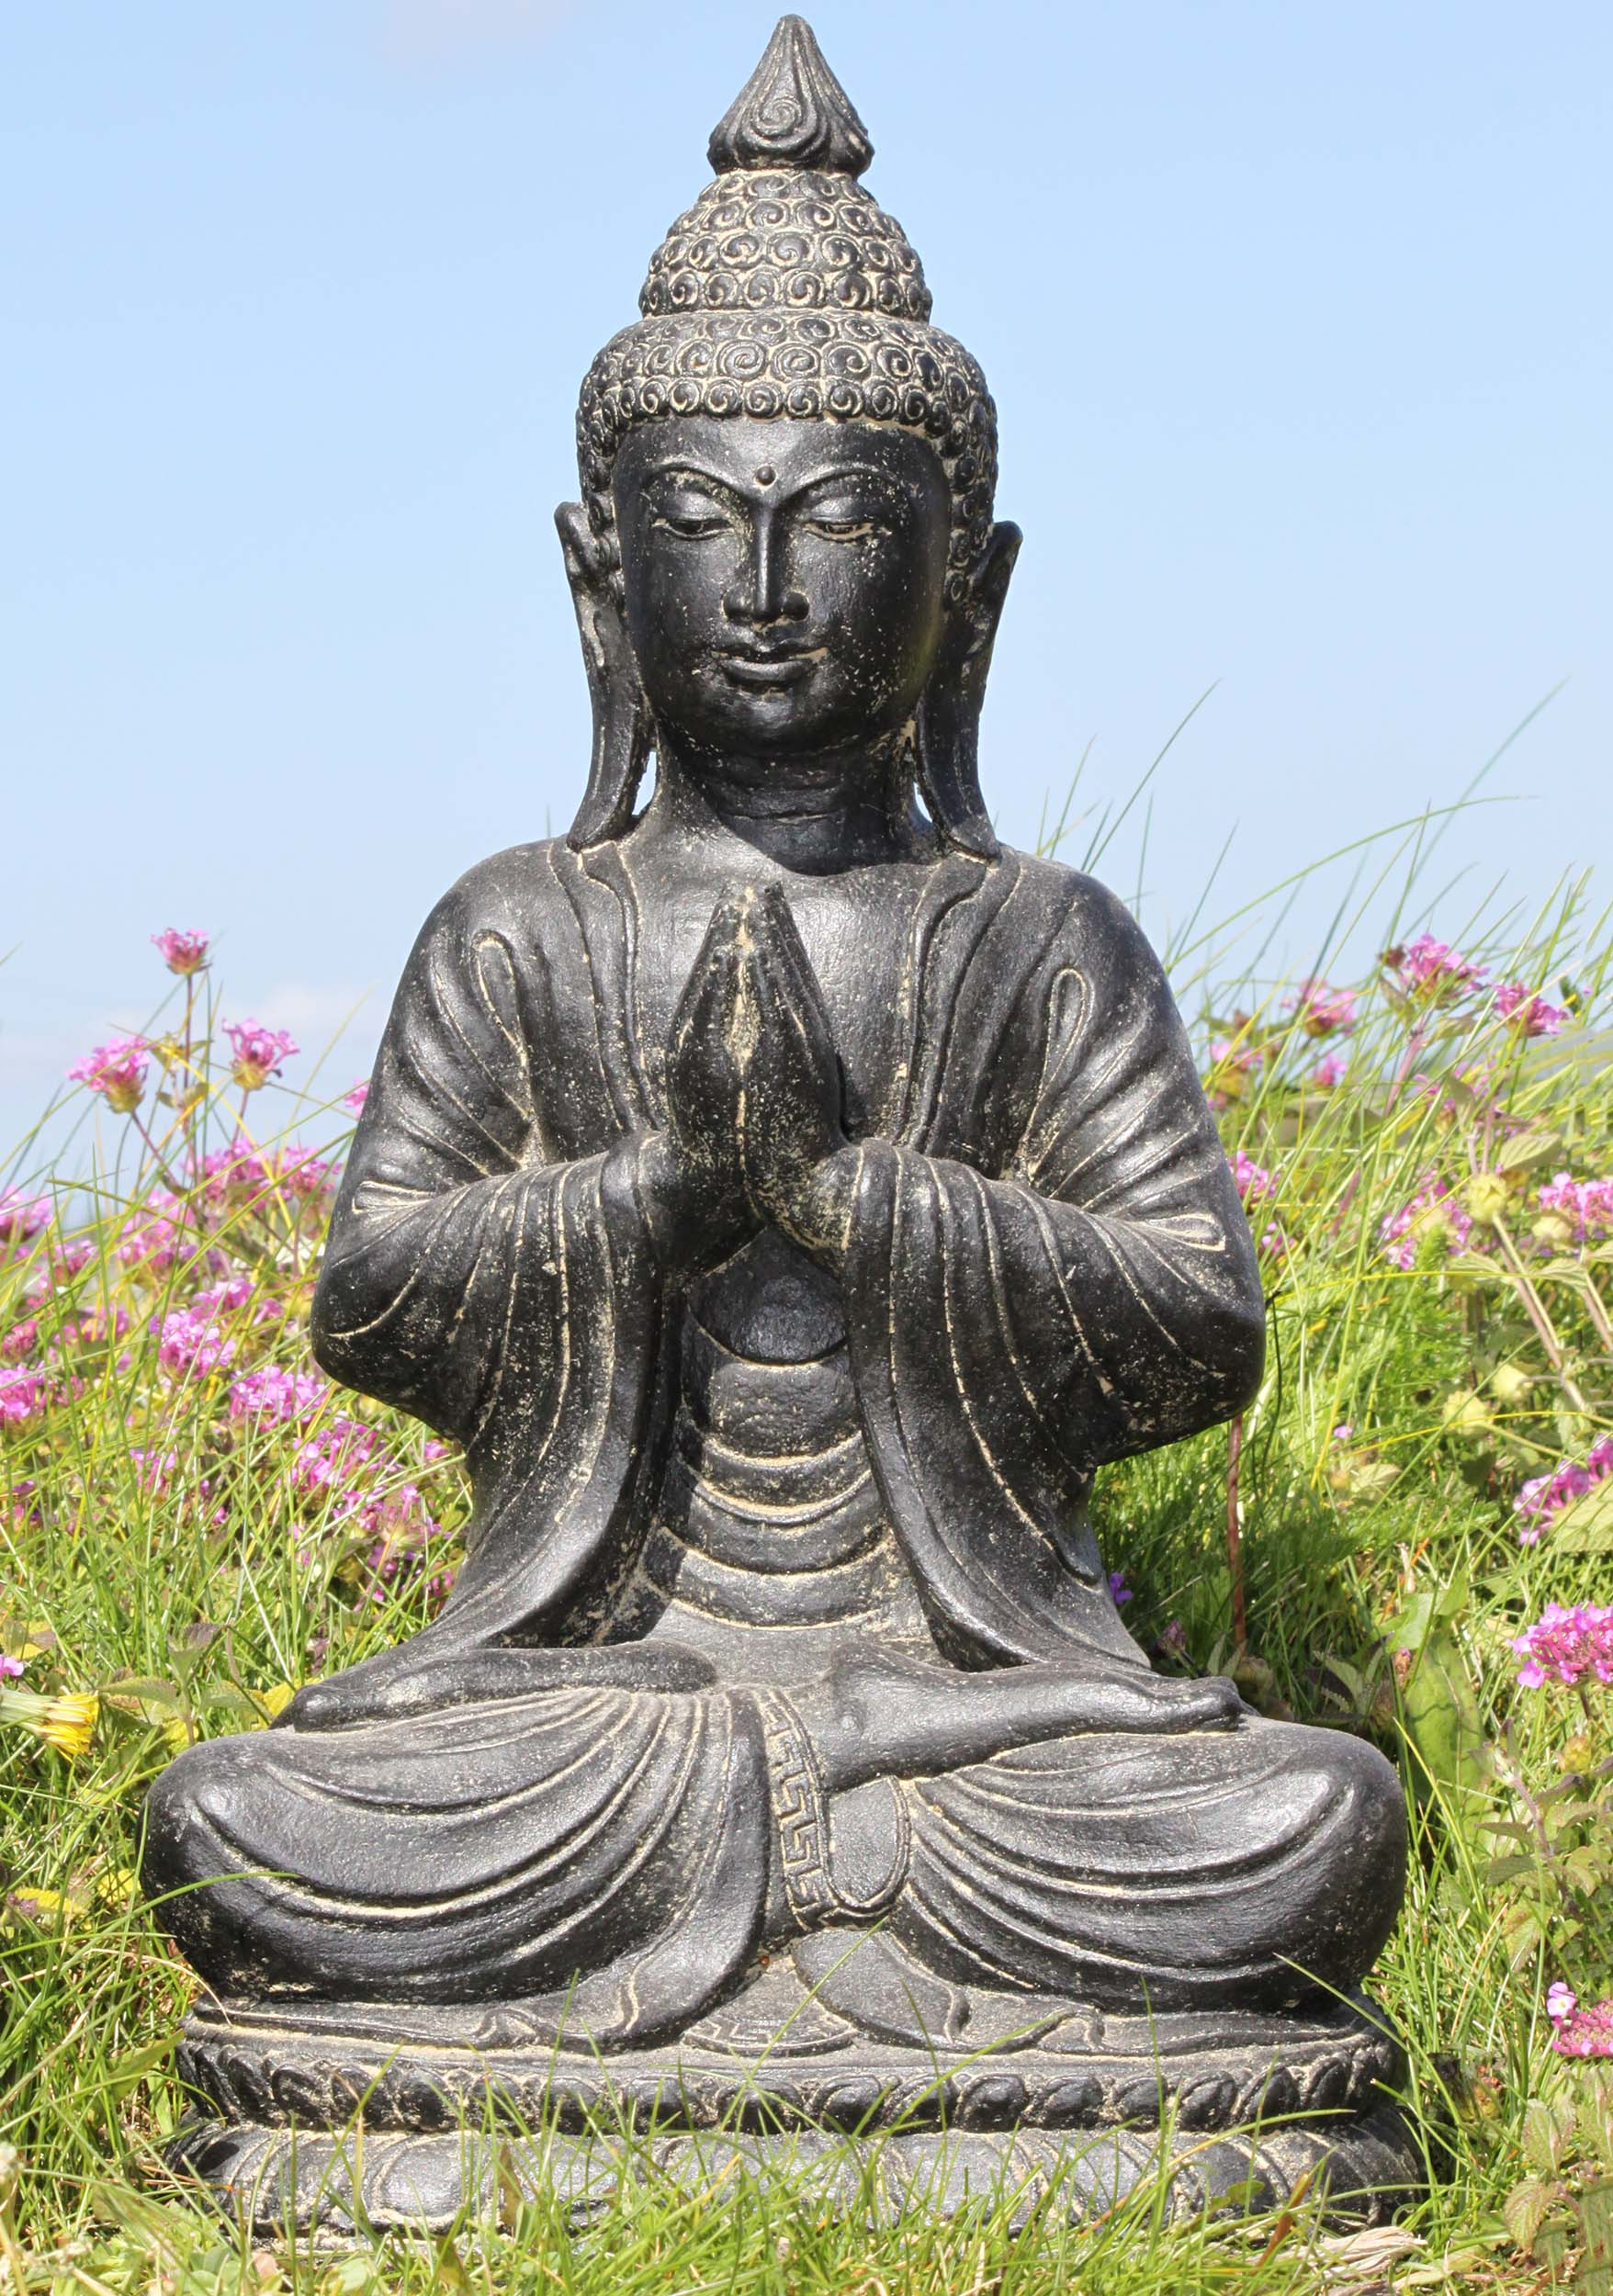 Preorder Namaste Garden Buddha Statue 18 83vc209z Hindu Gods